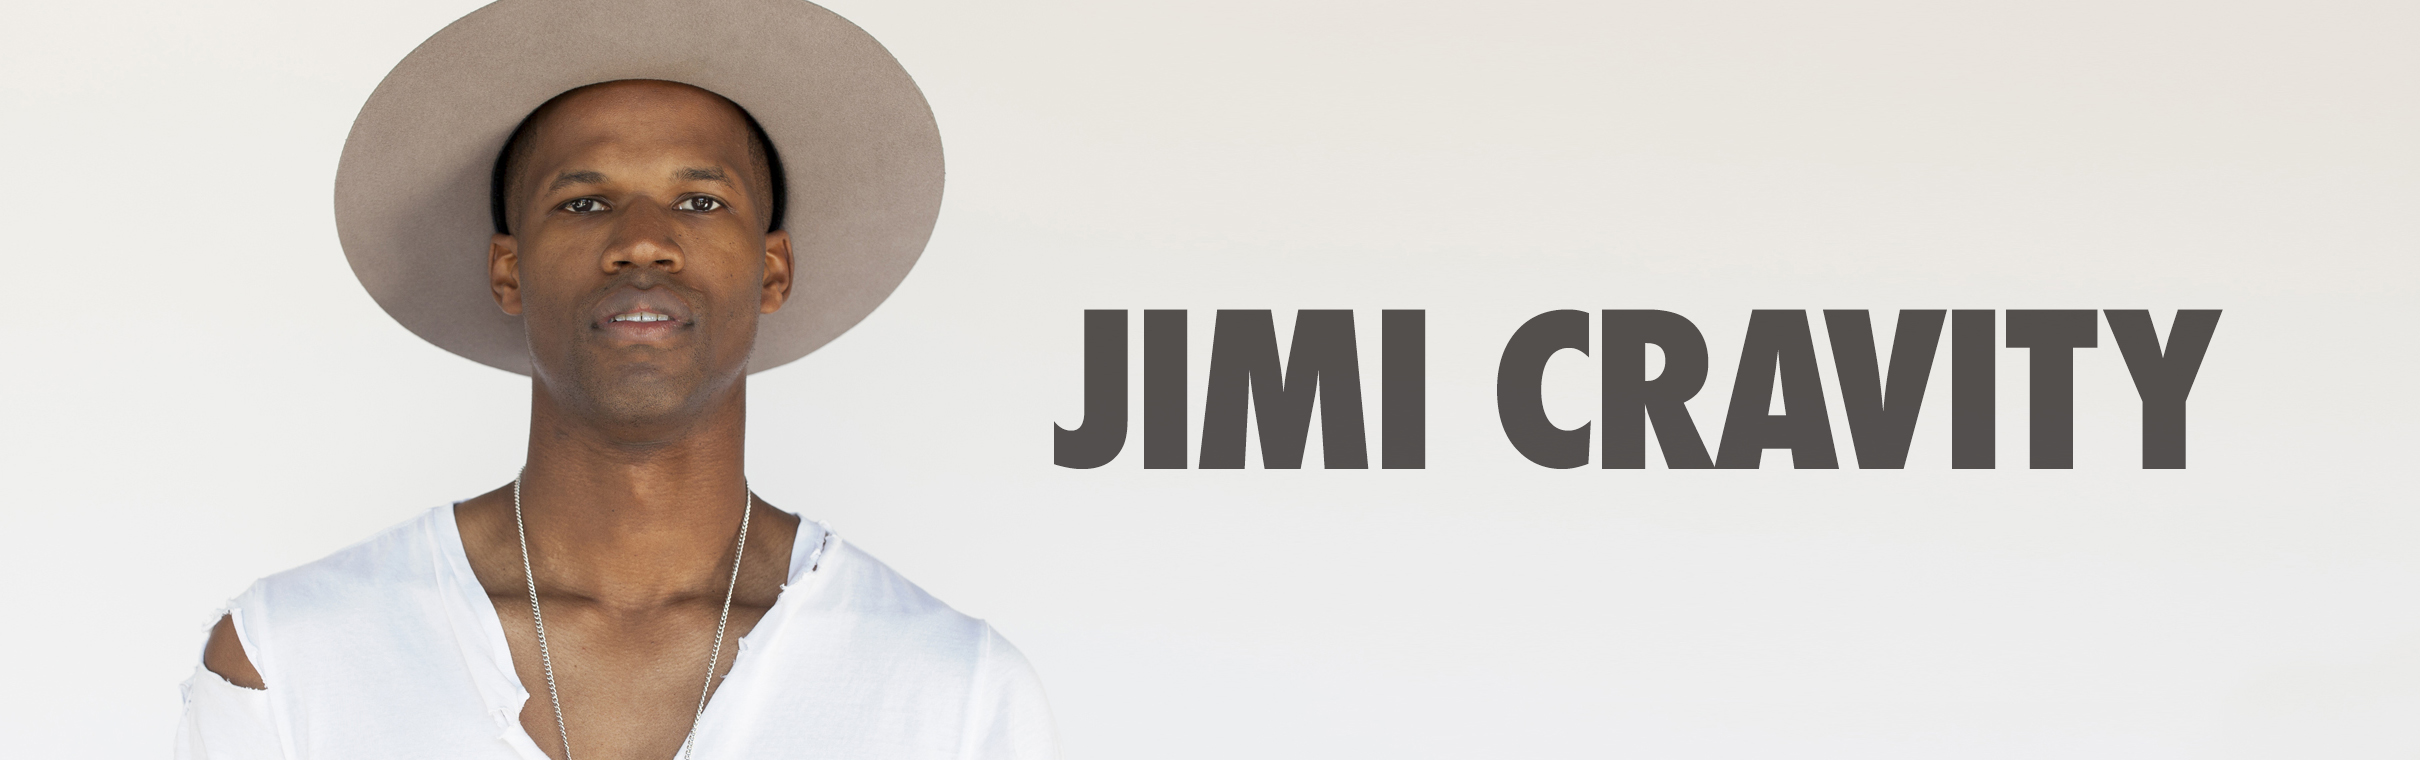 Jimi Cravity